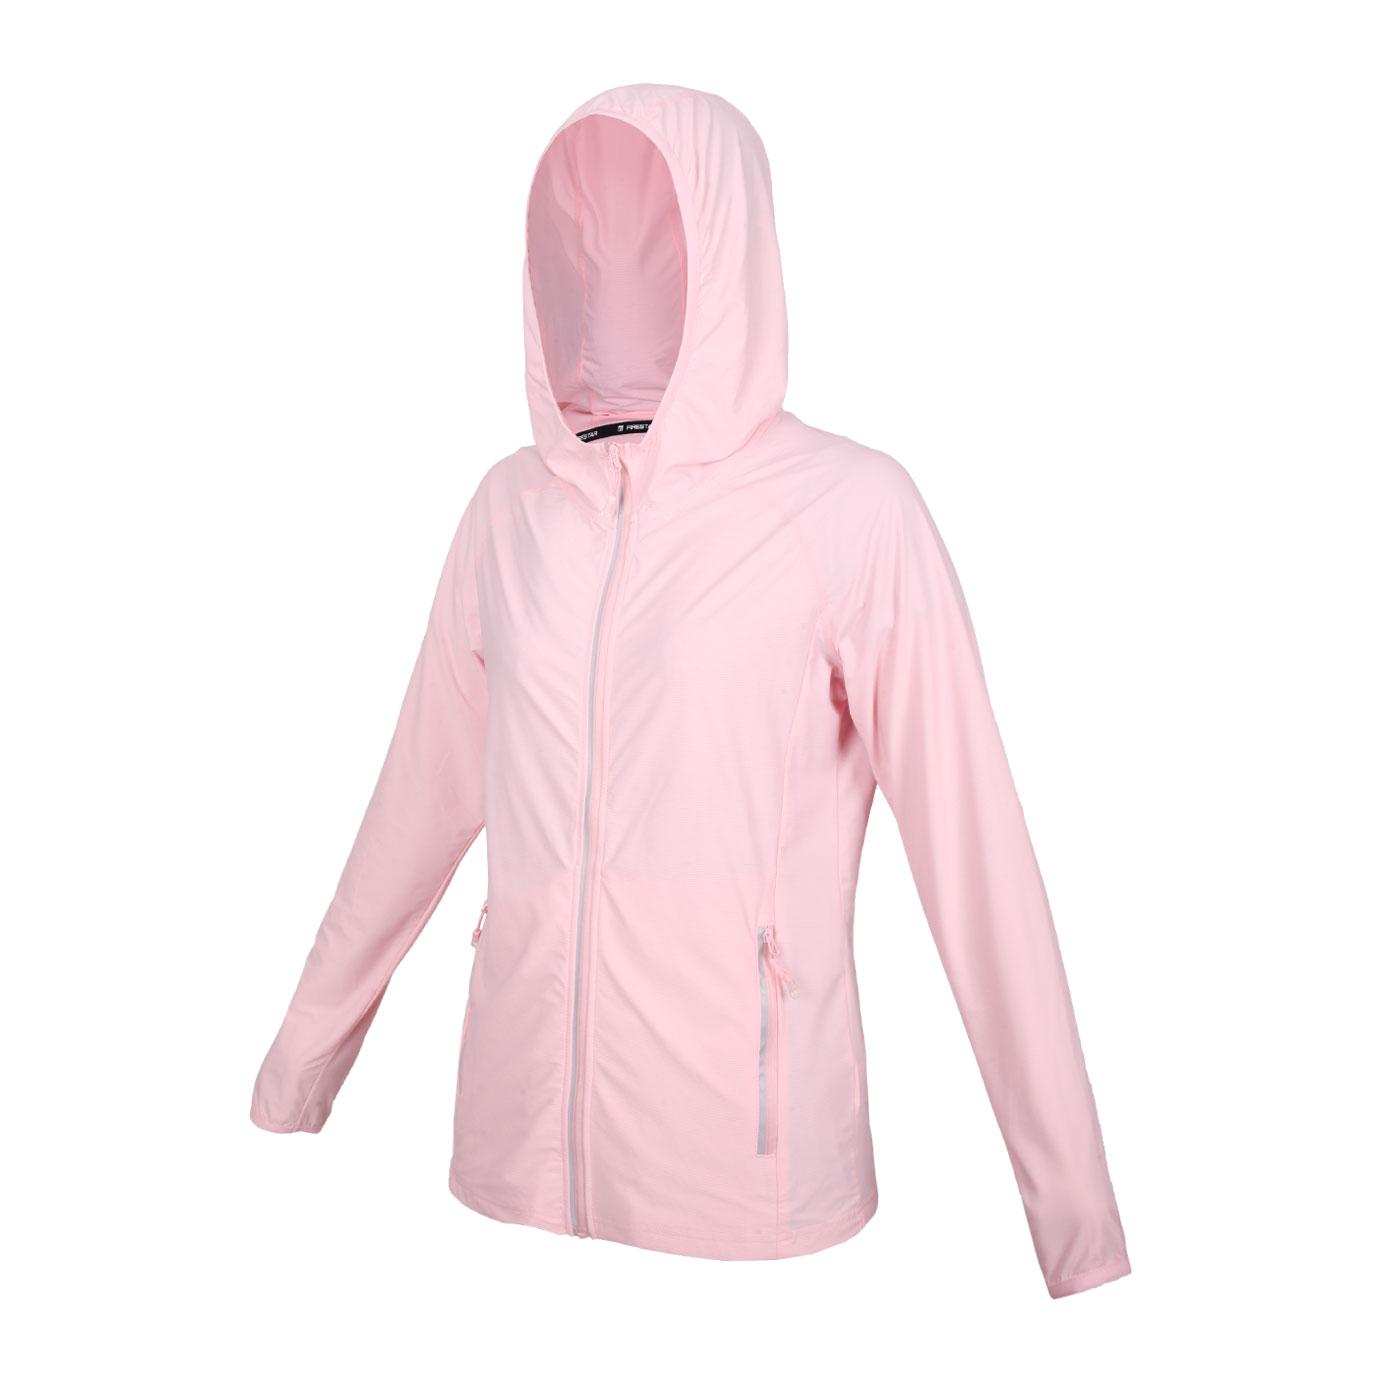 FIRESTAR 女款彈性防曬連帽外套 JL175-43 - 粉紅銀